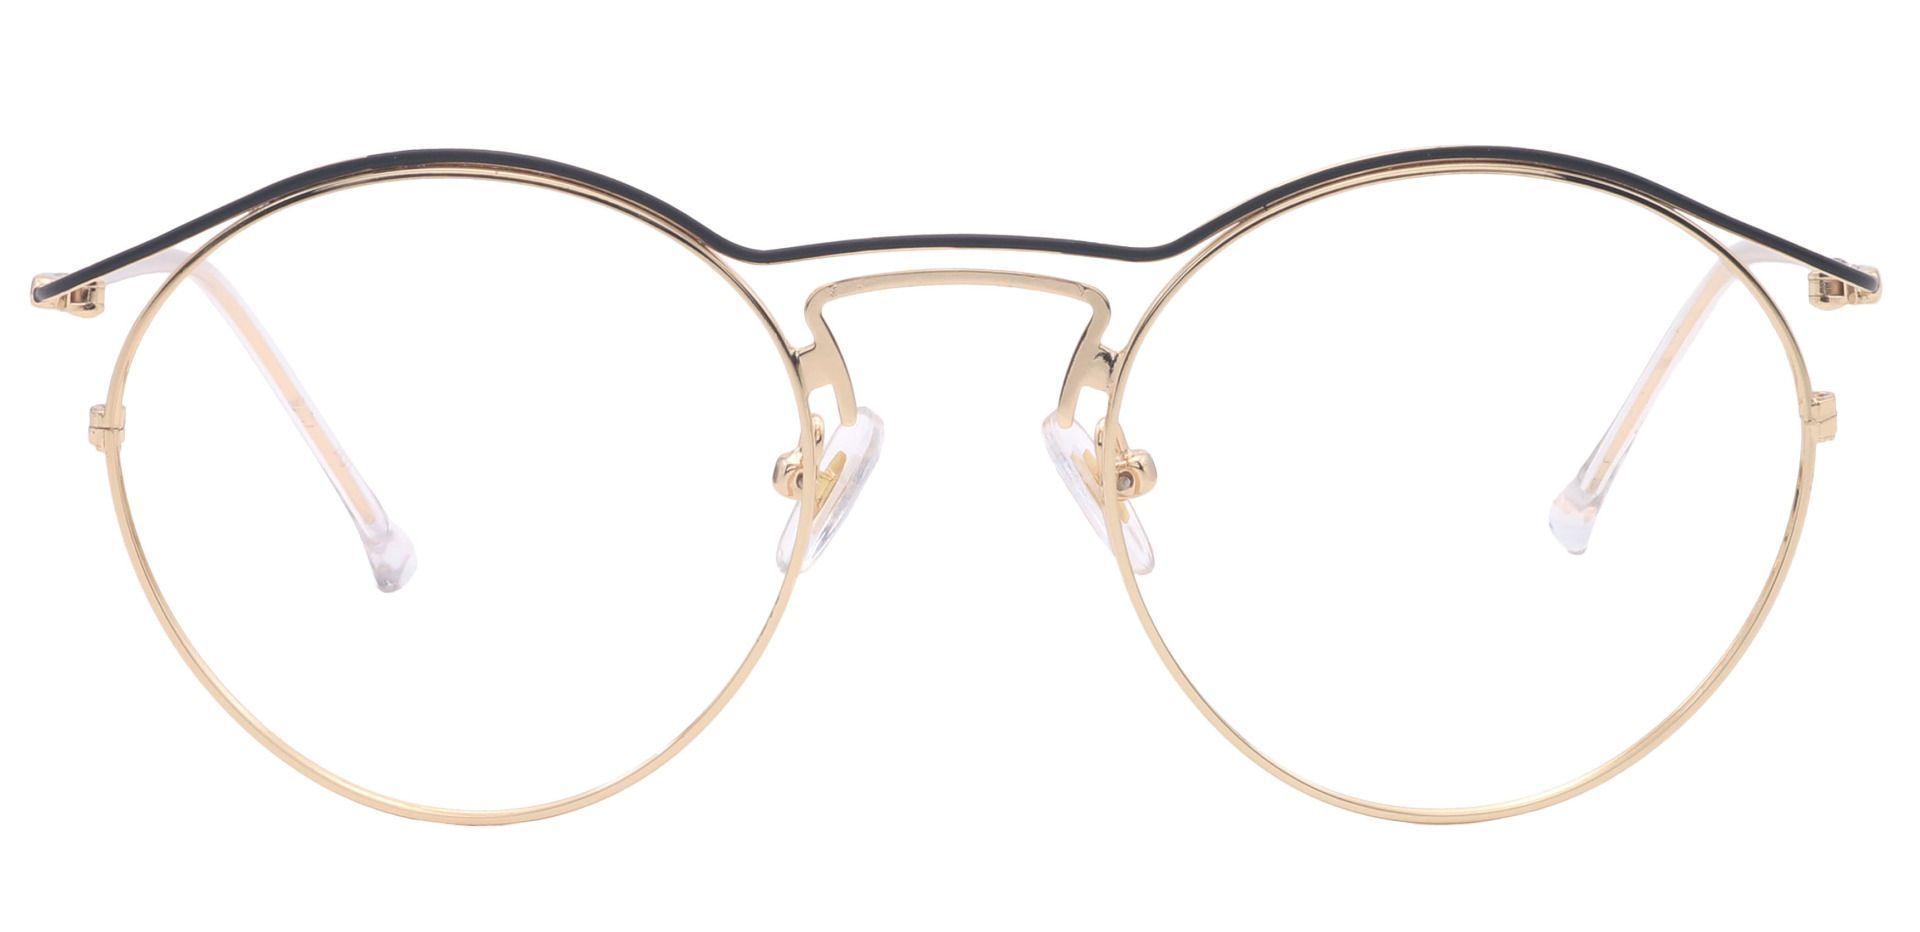 Milan Round Lined Bifocal Glasses - Yellow